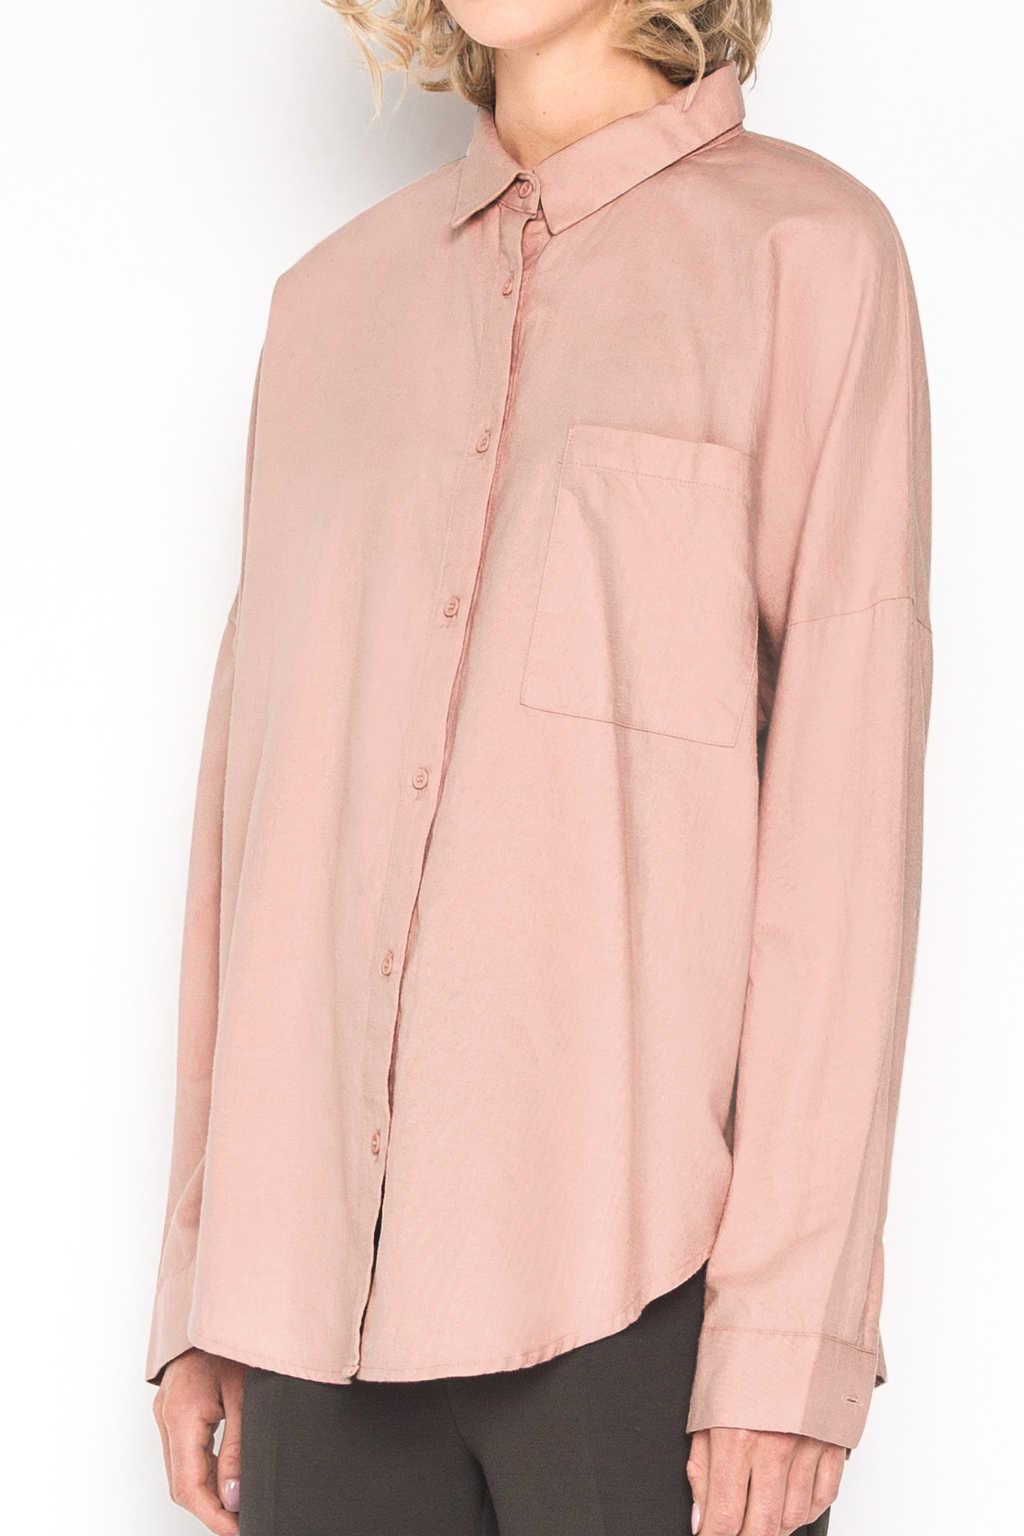 Blouse 1773 Pink 7